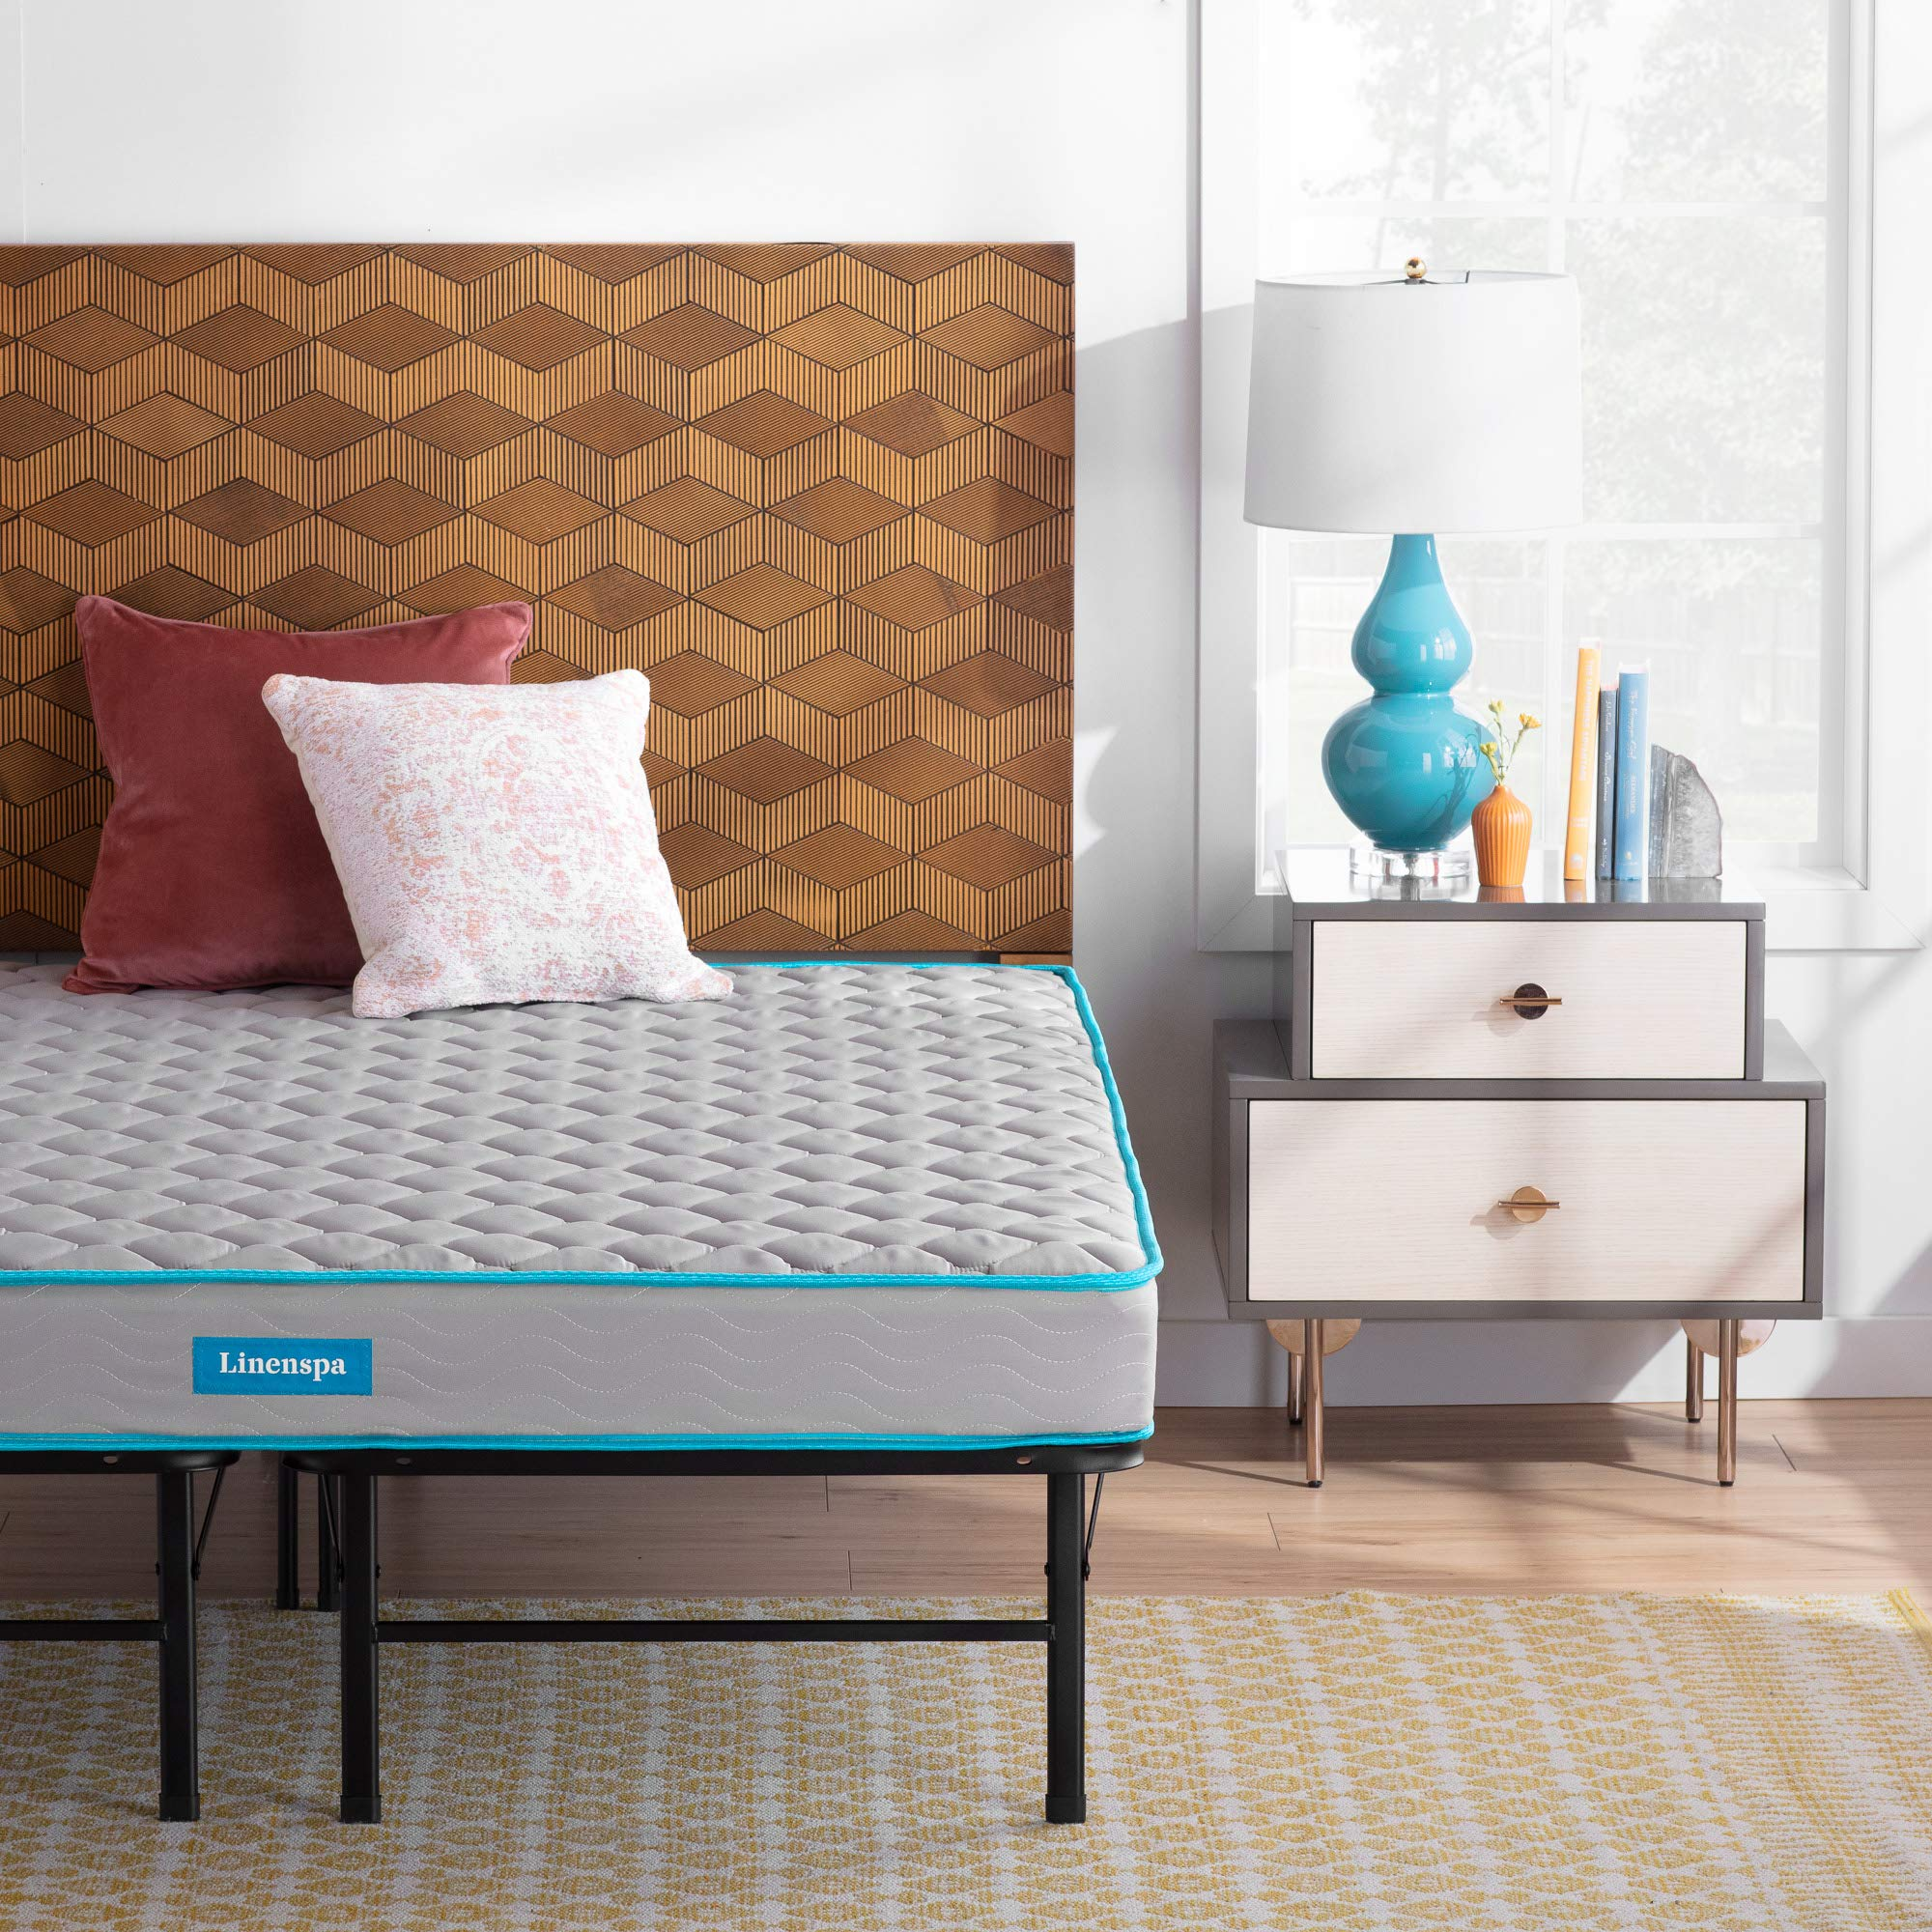 Linenspa 6 Inch Innerspring Mattress with Linenspa 14 Inch Folding Platform Bed Frame - Full